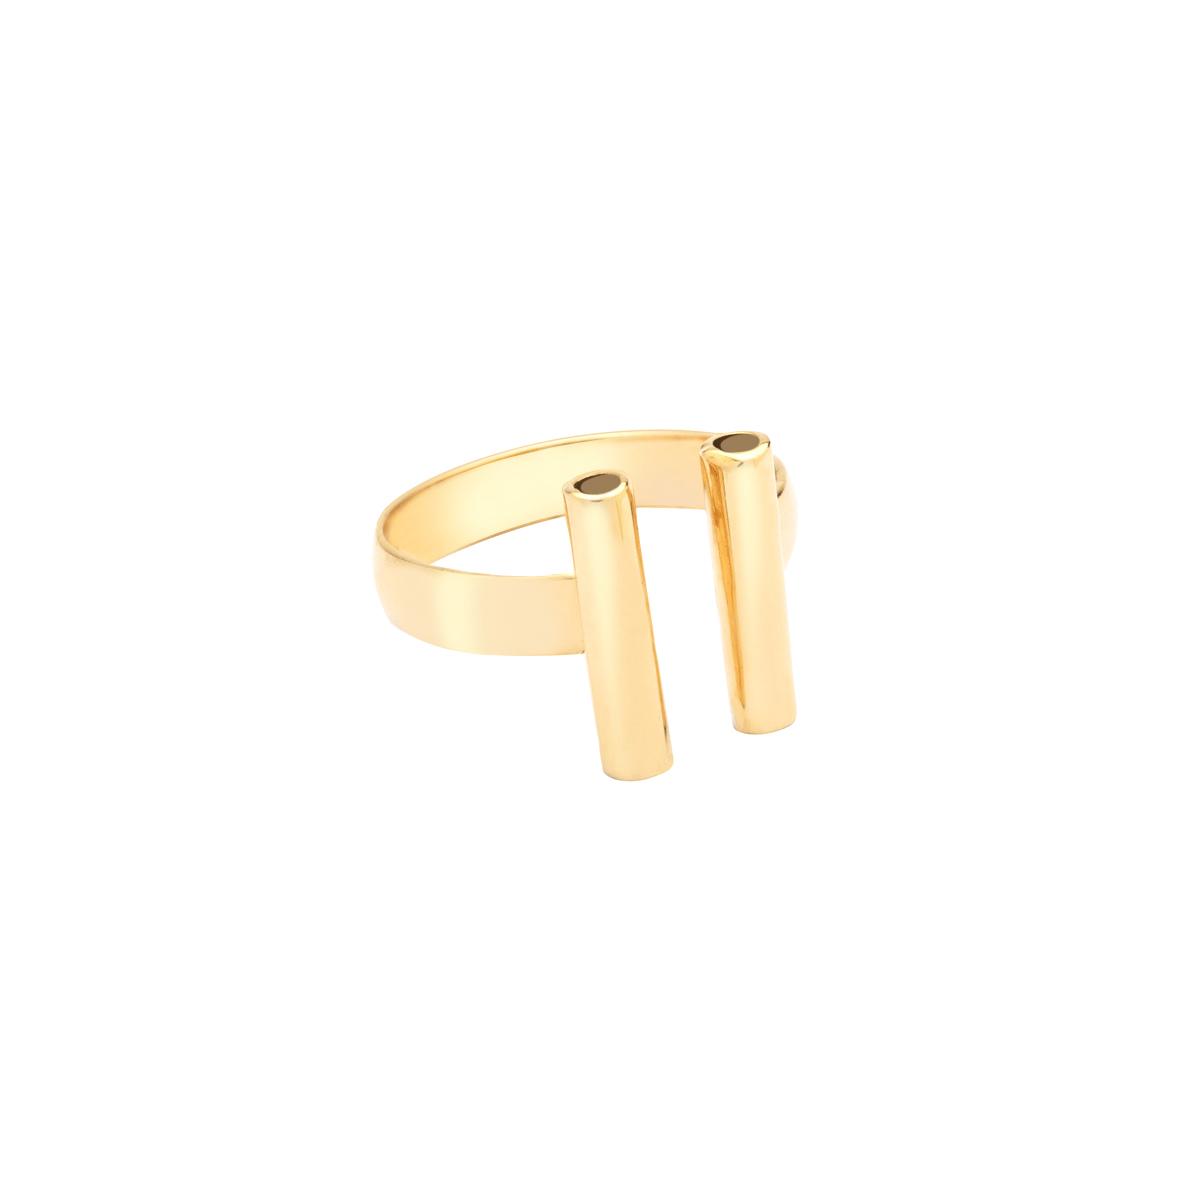 انگشتر طلا دو استوانه